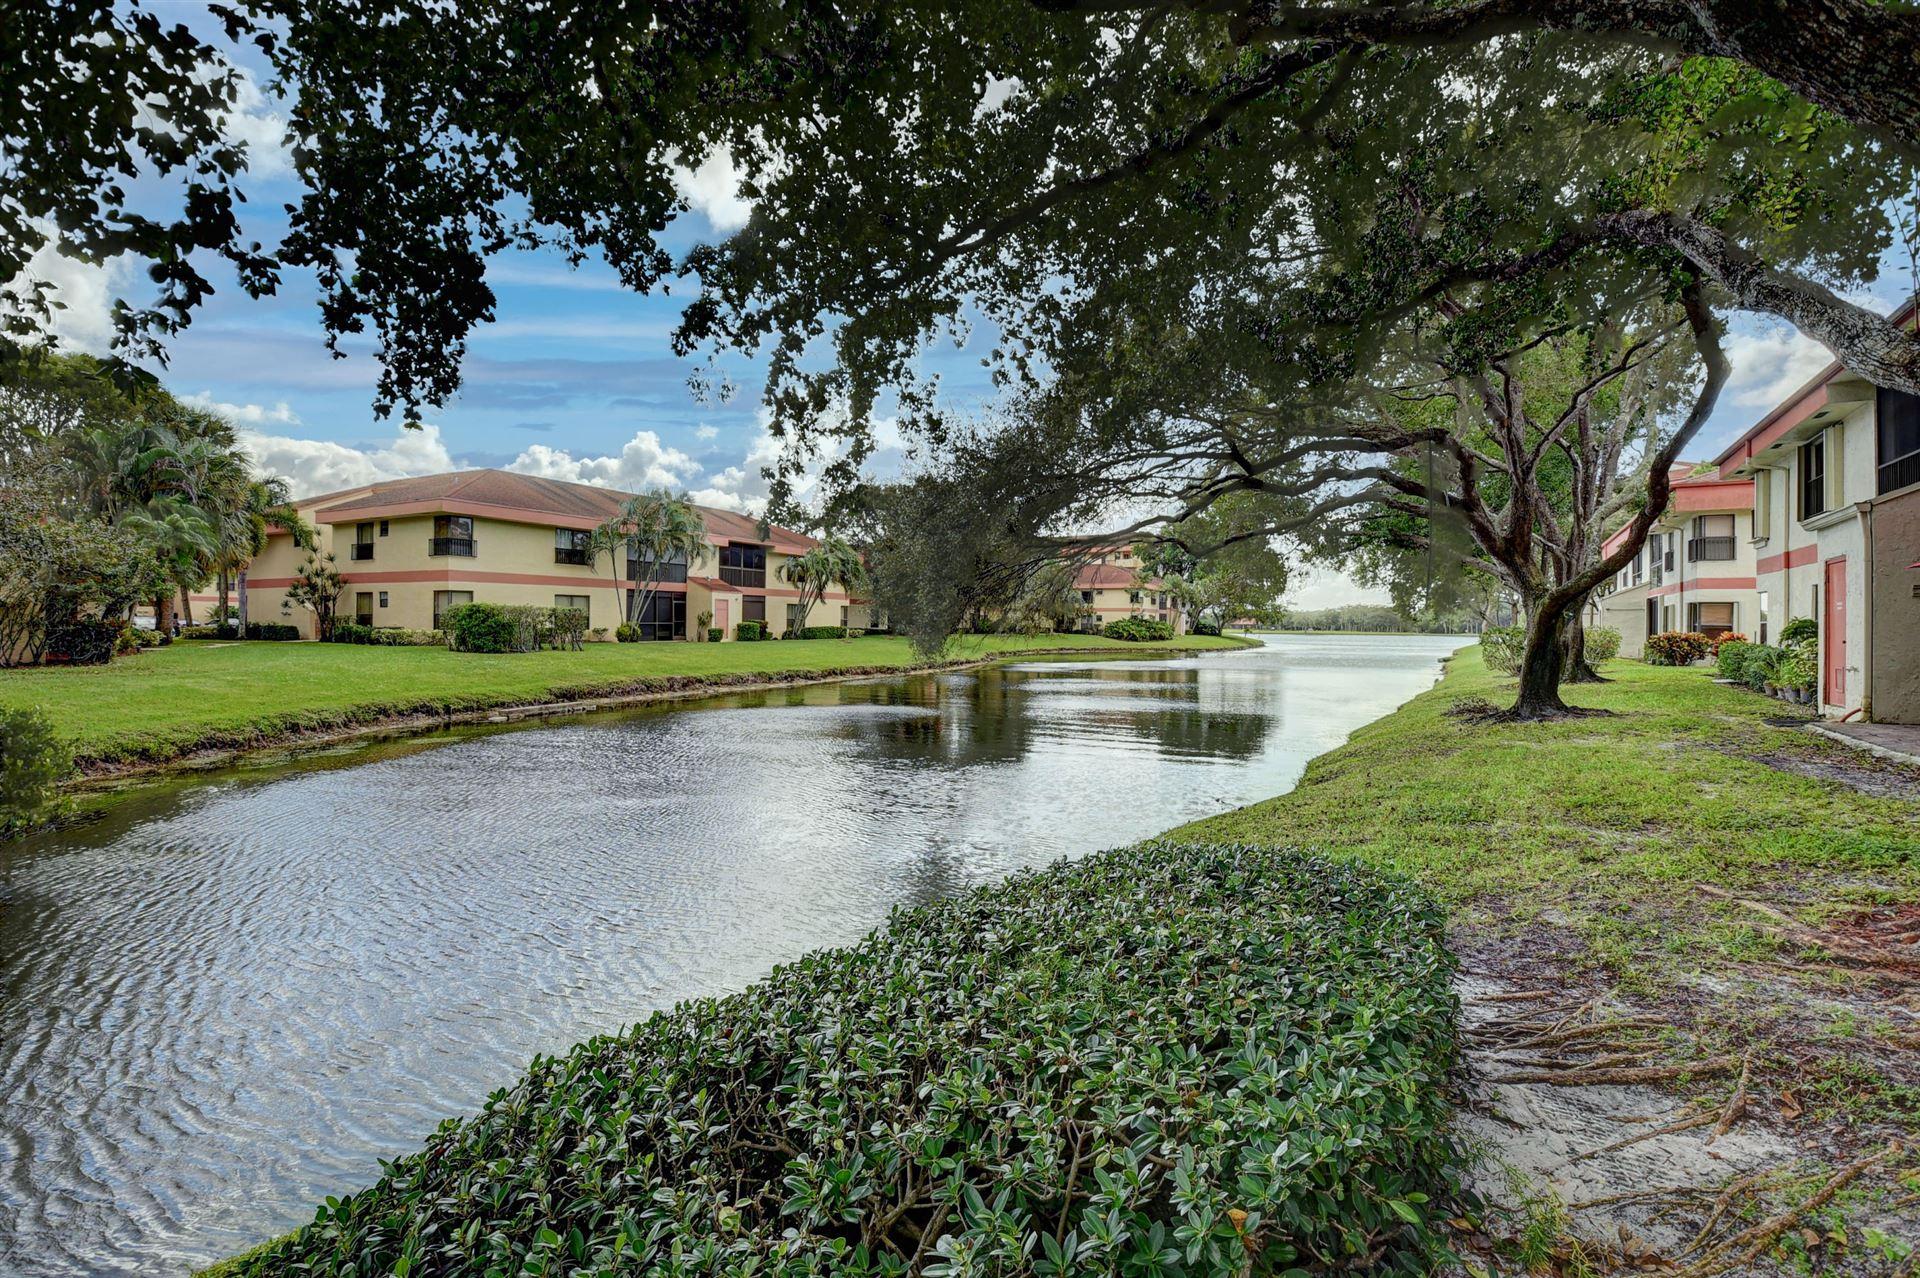 2881 Carambola Circle S, Coconut Creek, FL 33066 - #: RX-10674333